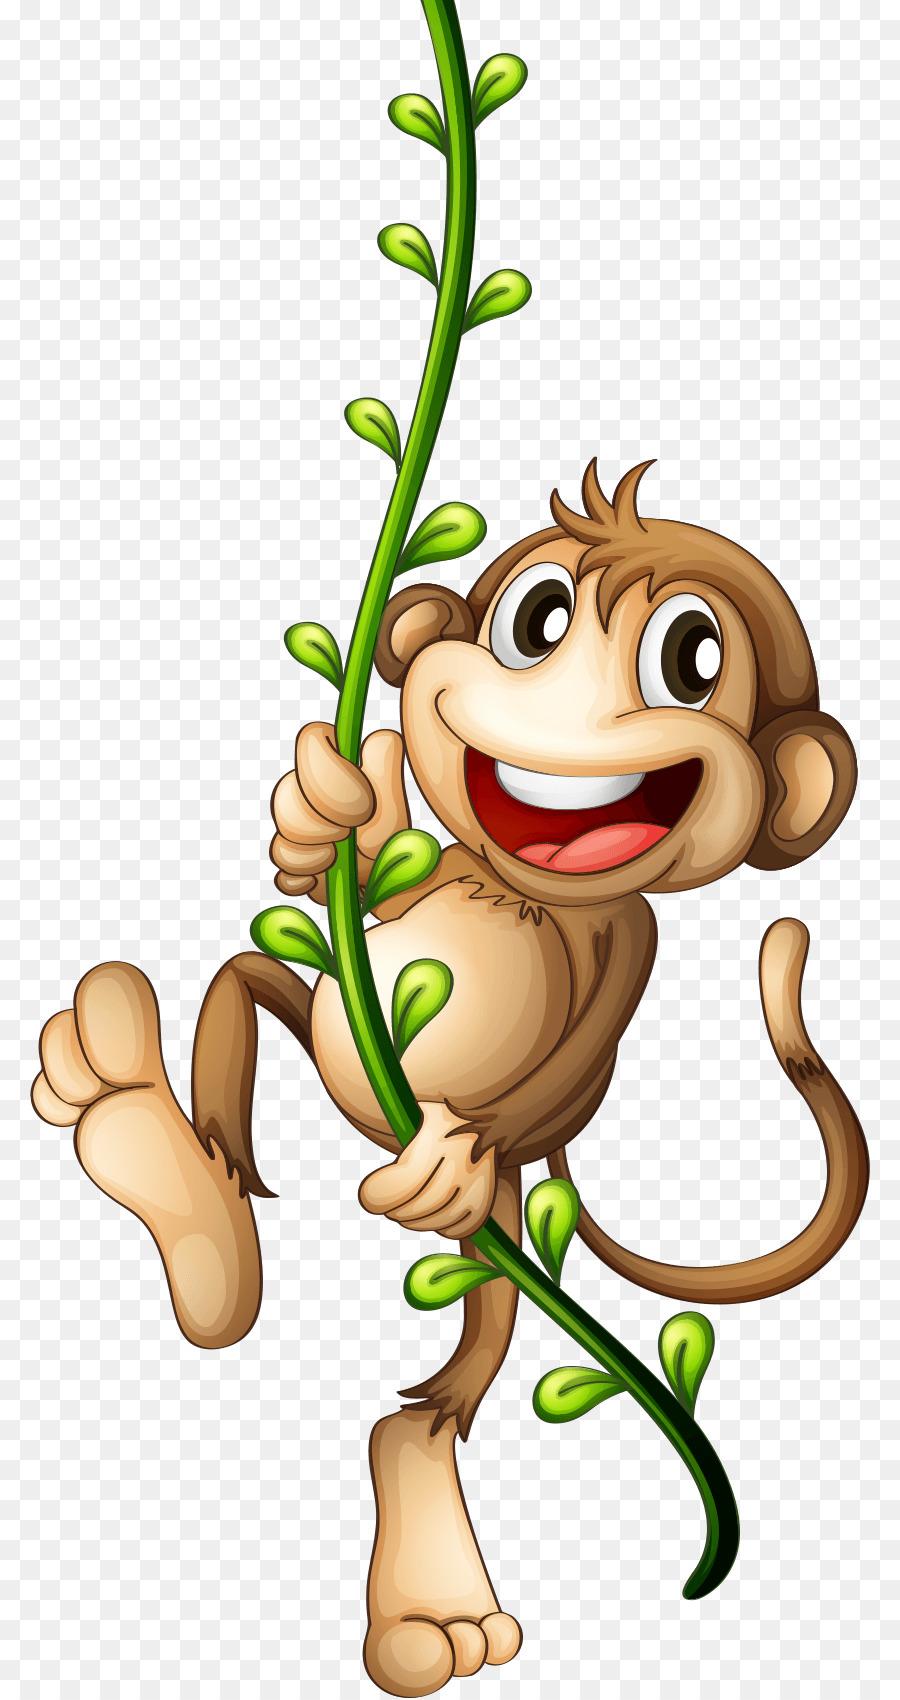 Monkey on vine clipart svg free Monkey Cartoon png download - 840*1698 - Free Transparent ... svg free